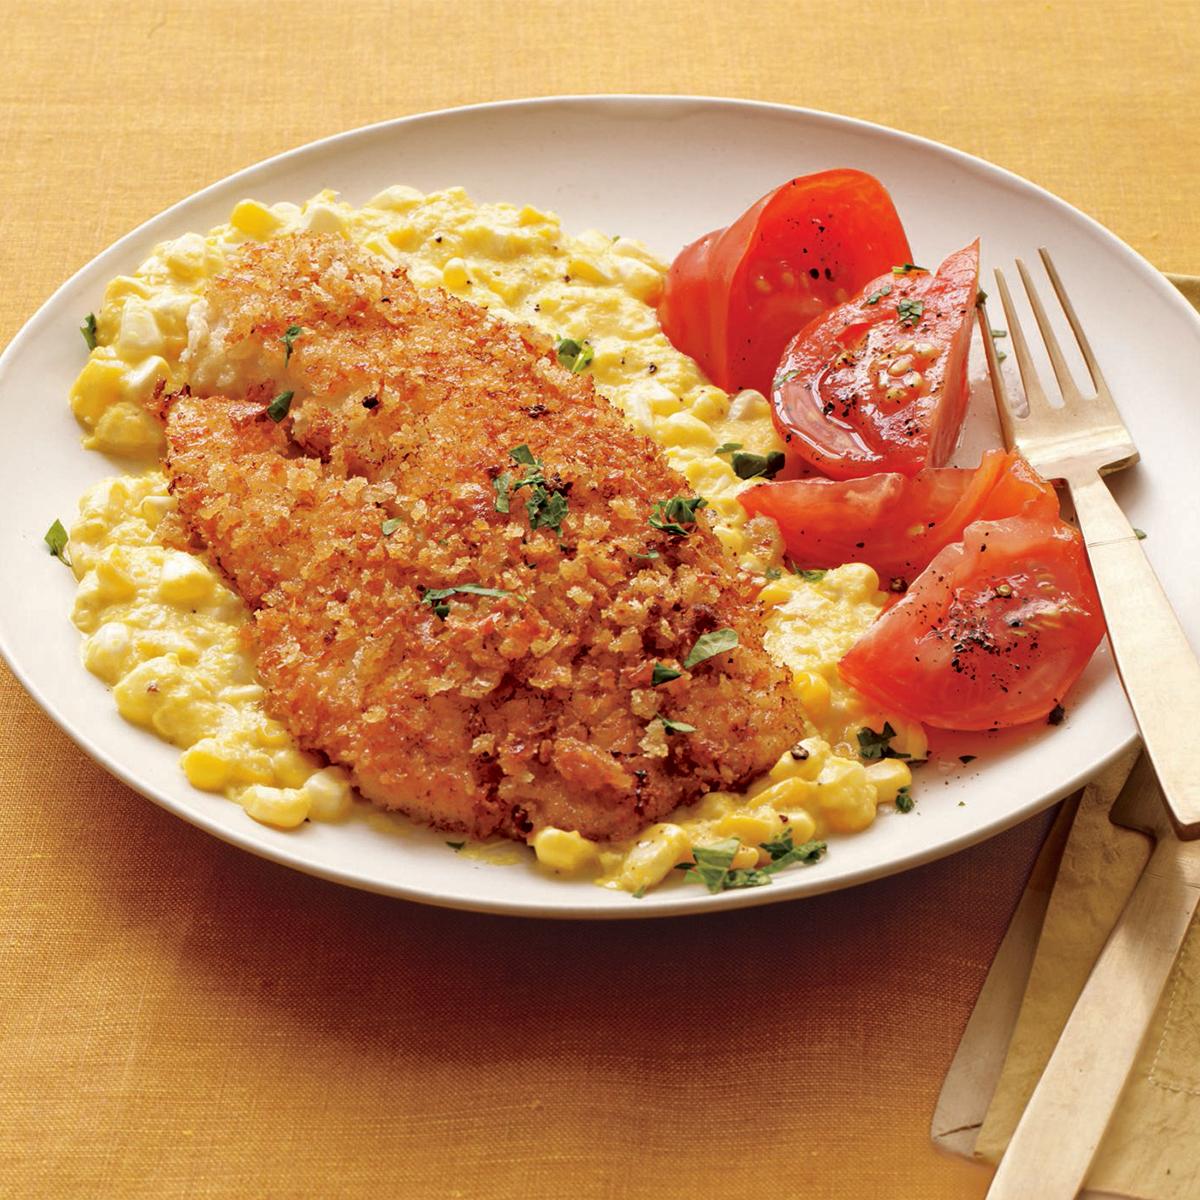 Crispy Fish with Creamed Corn